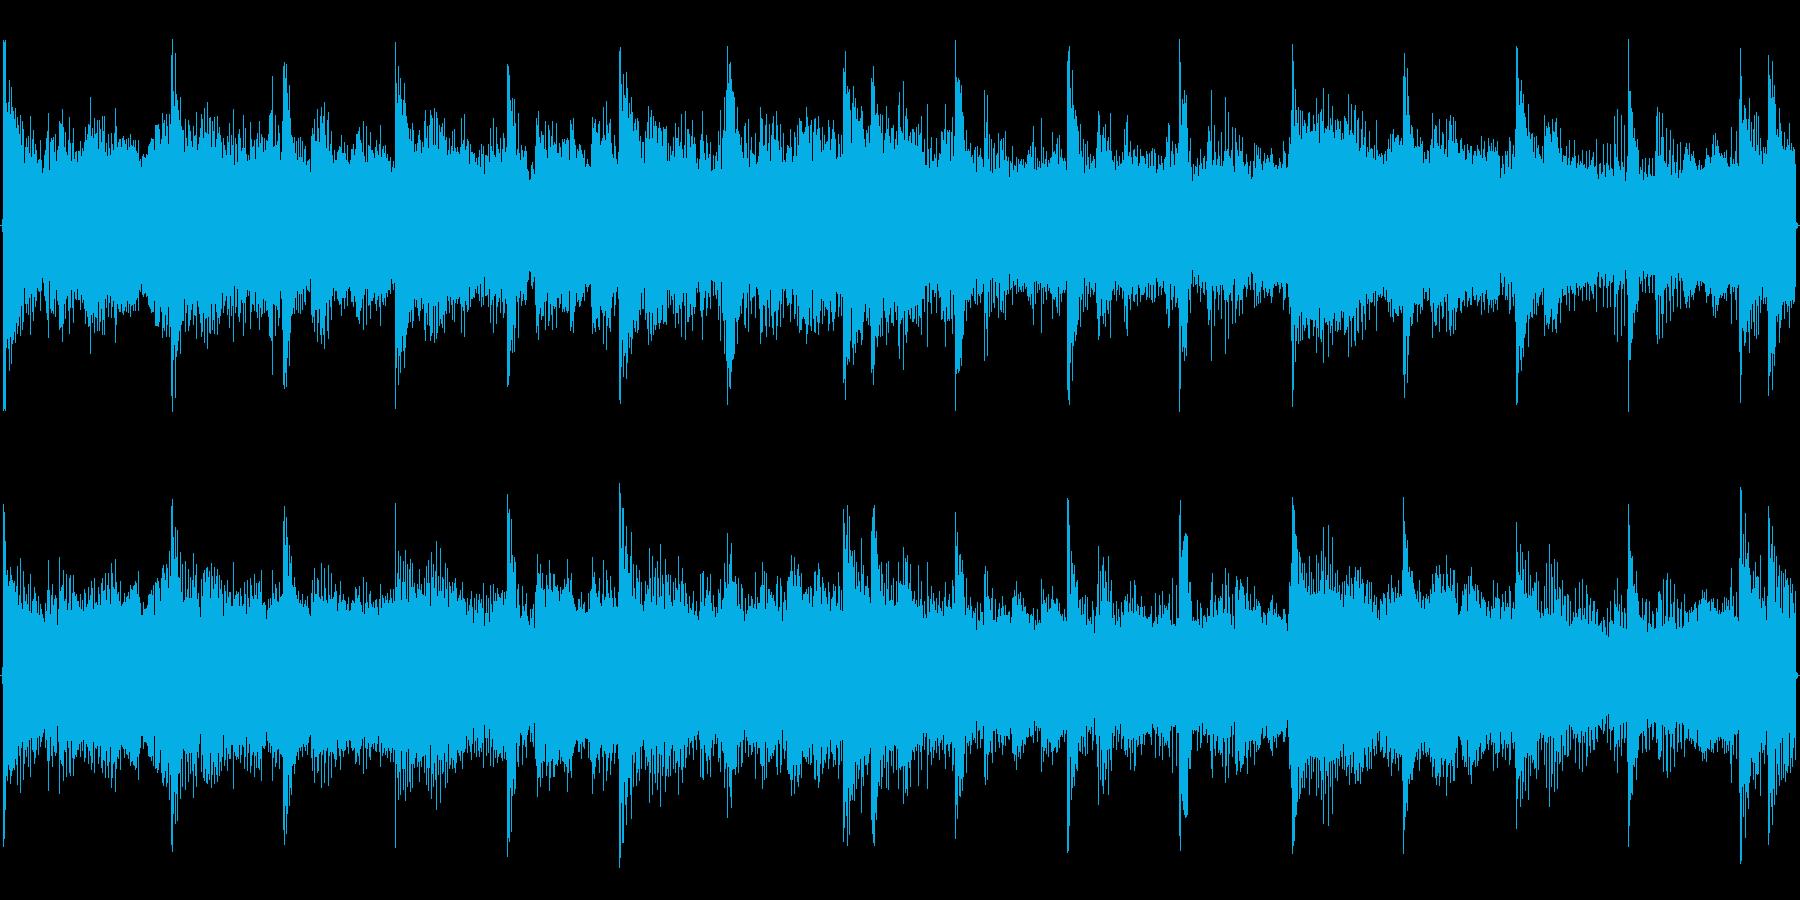 8bitチューンのRPG風エンディング1の再生済みの波形